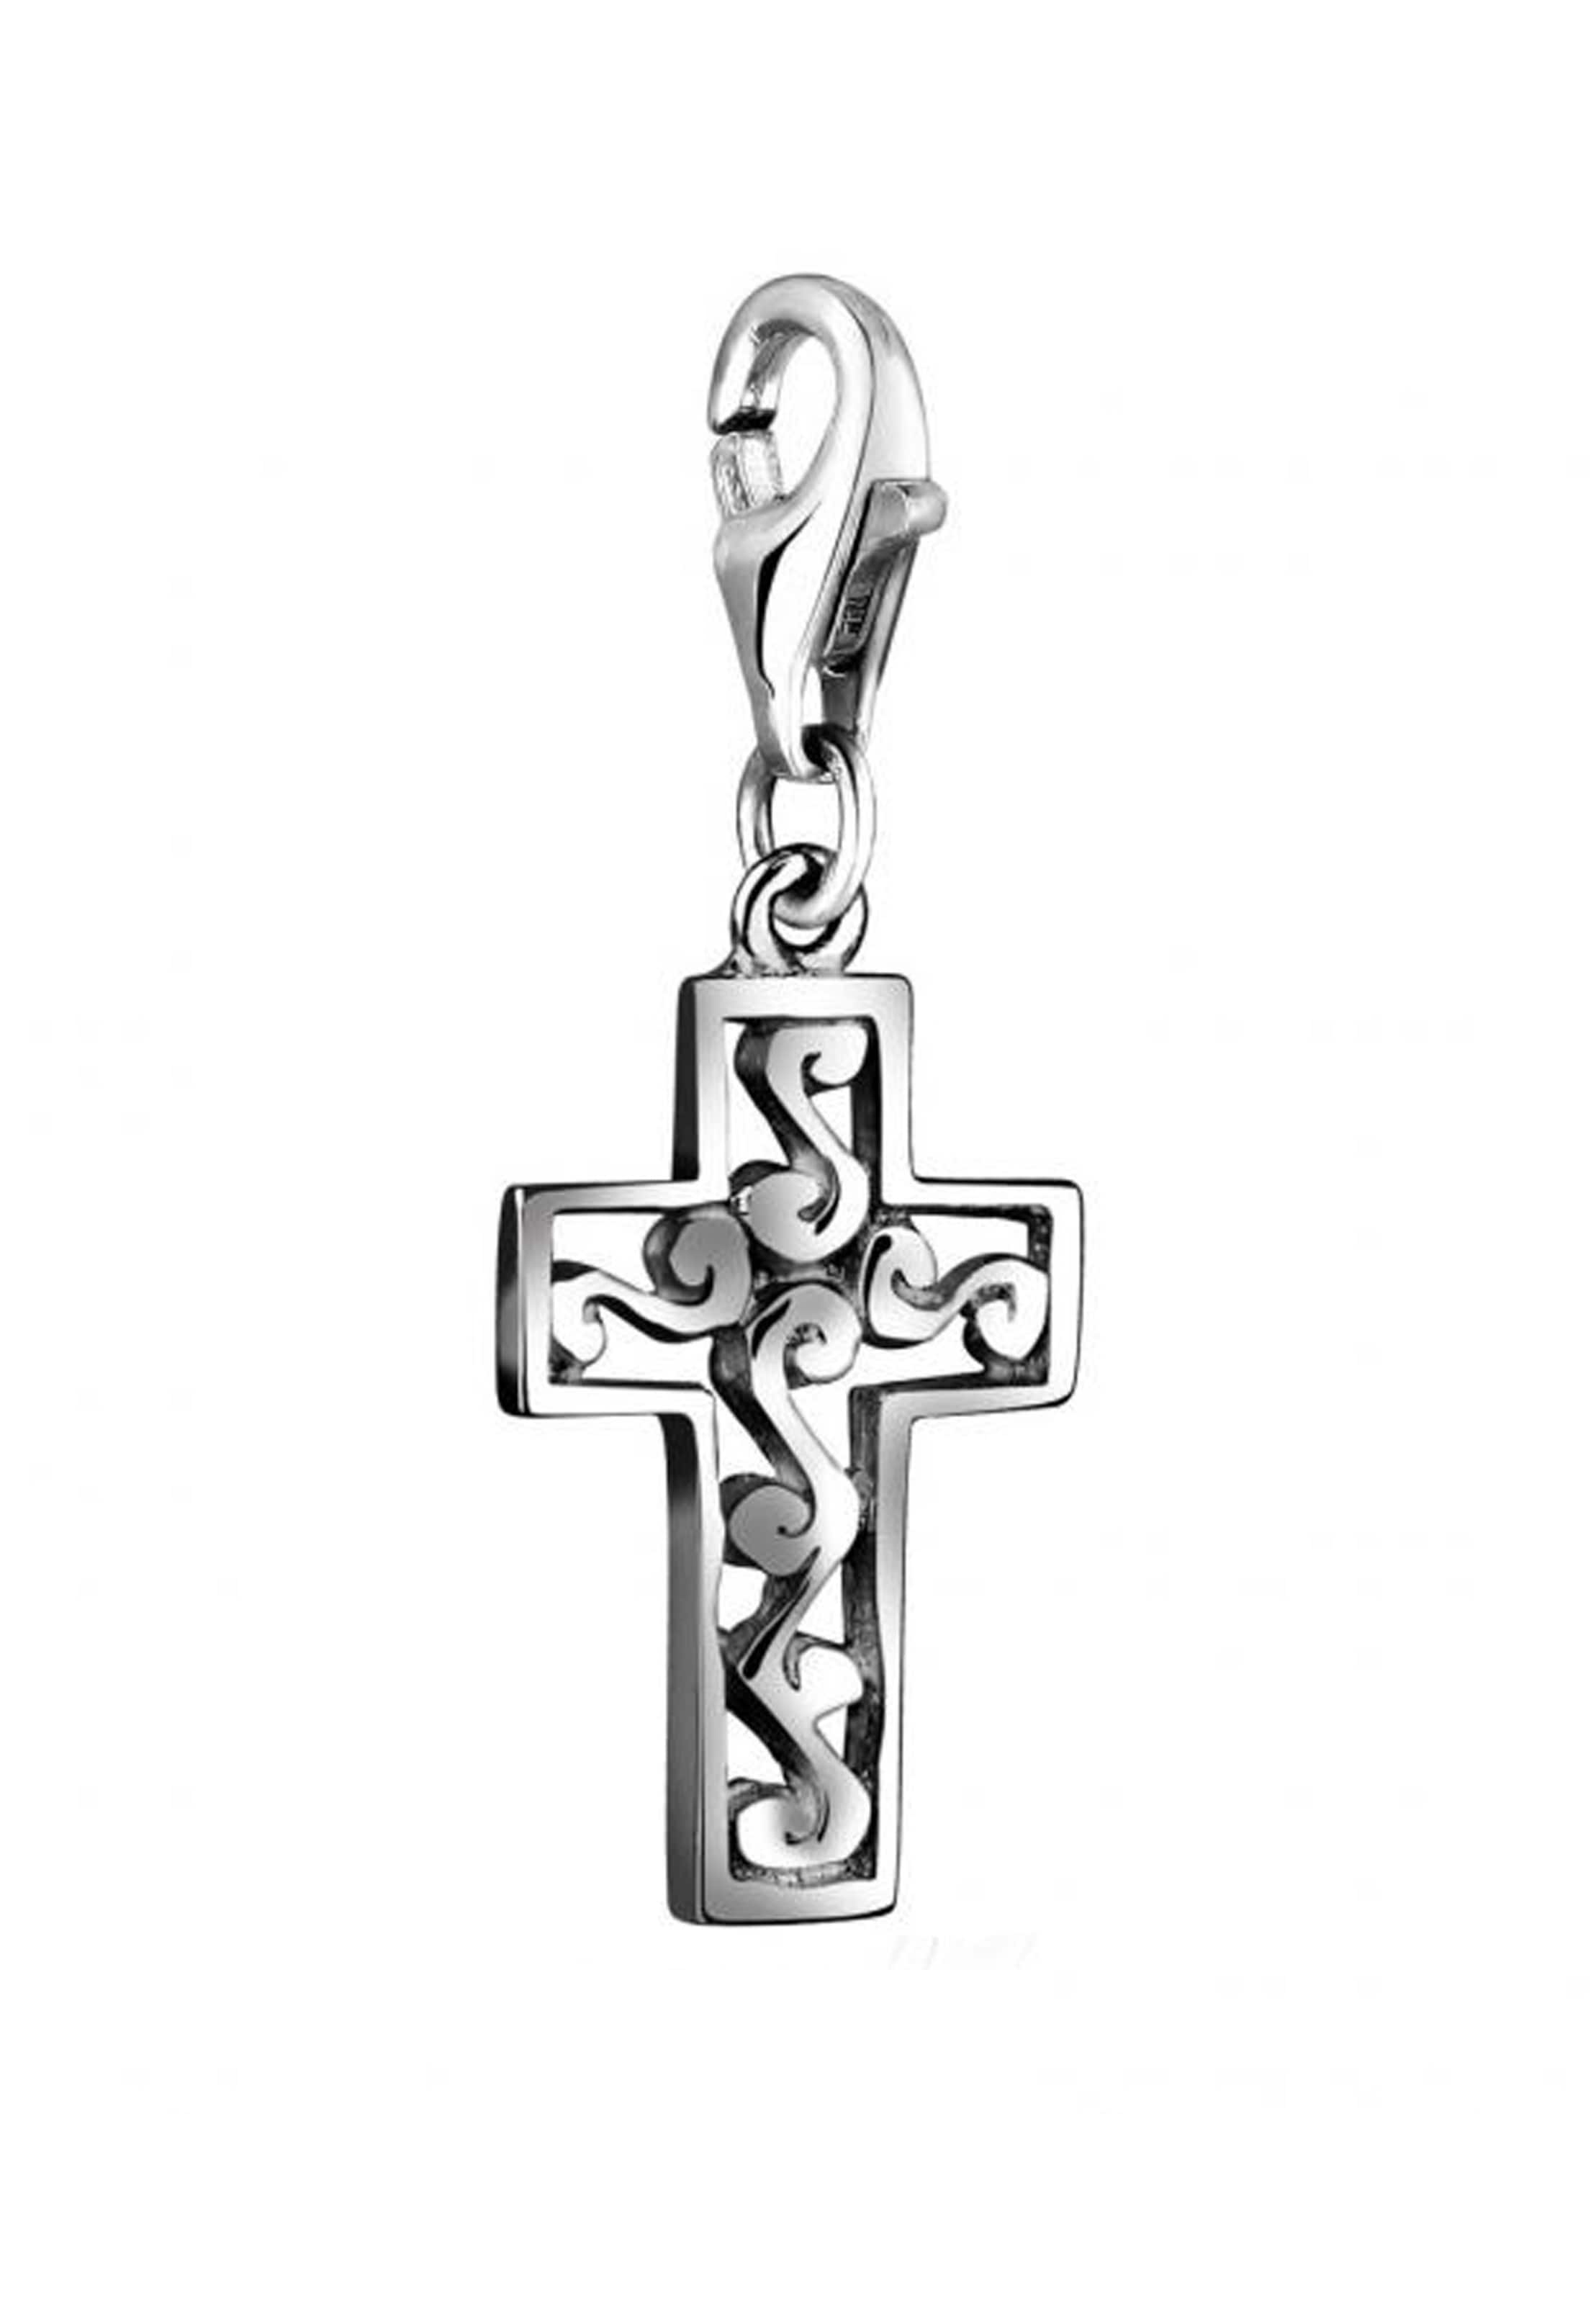 Charm 'kreuz' In Silber Nenalina D9I2EHW